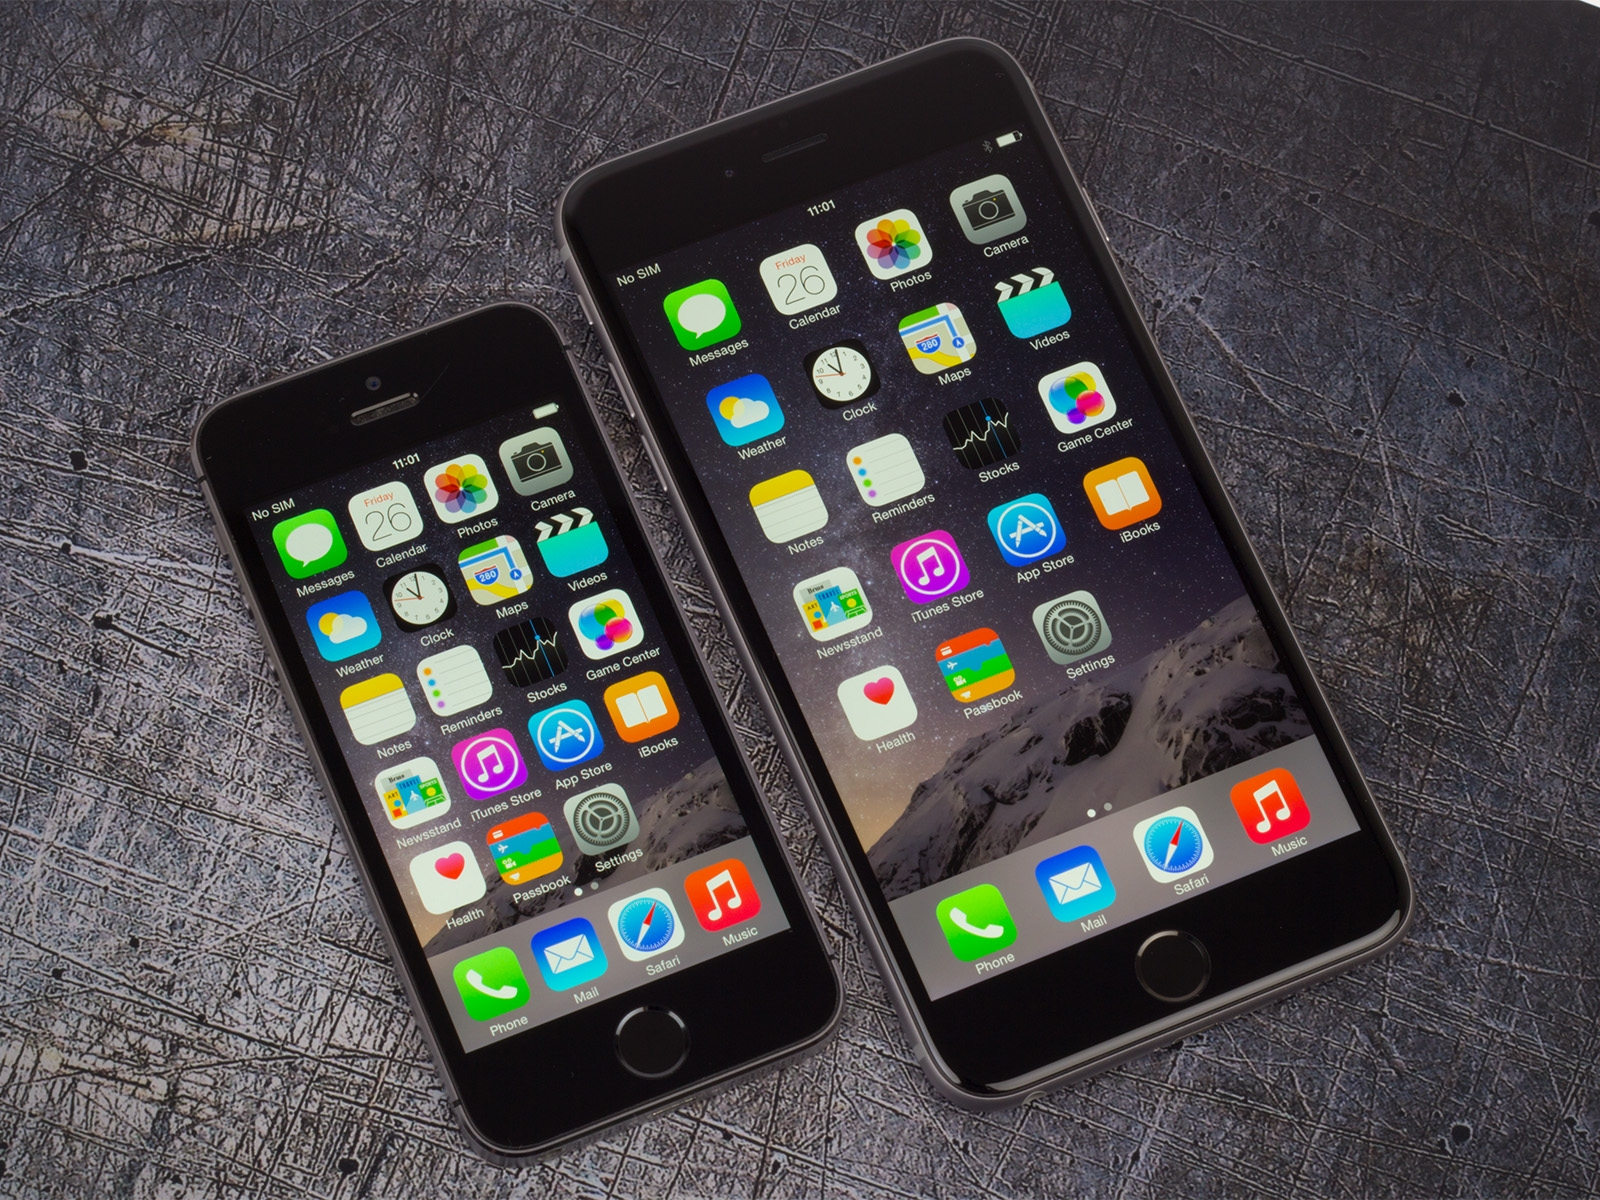 ФАС возбудила дело против Apple из-за одинаковых цен ритейлеров на iPhone 6s